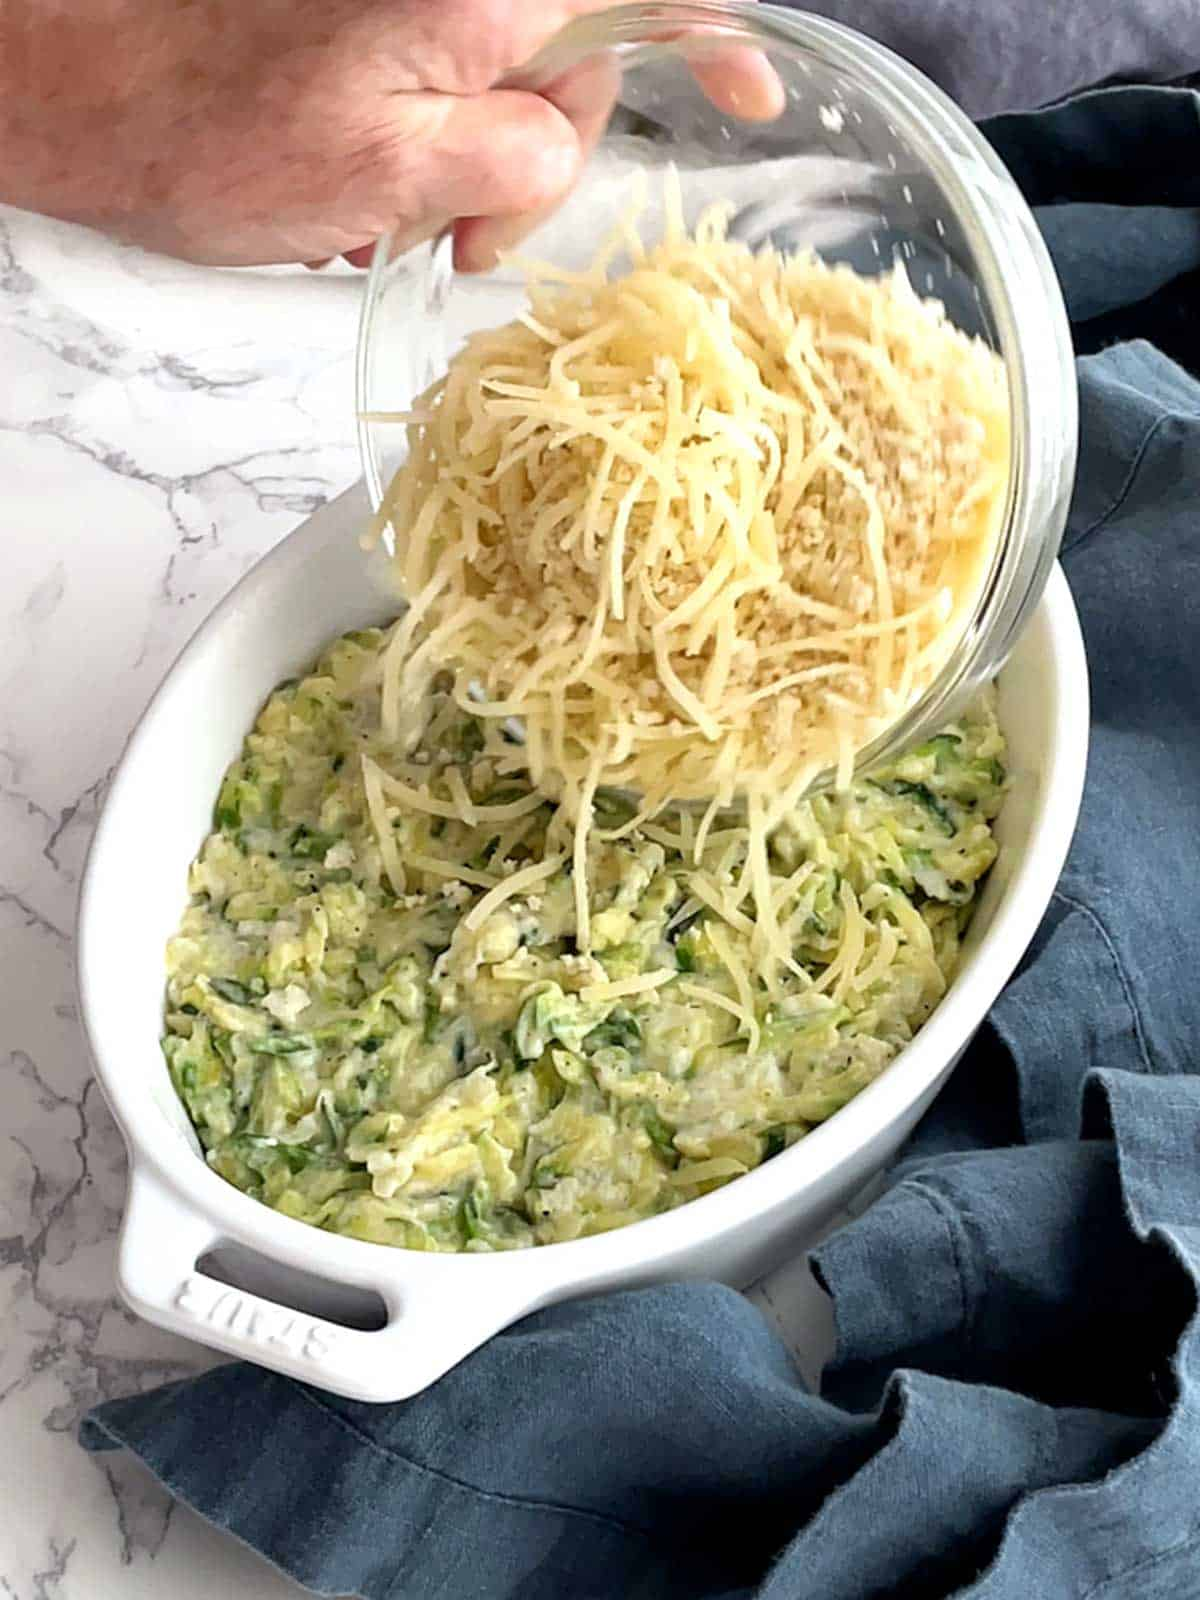 Topping zucchini gratin with cheese/panko mixture